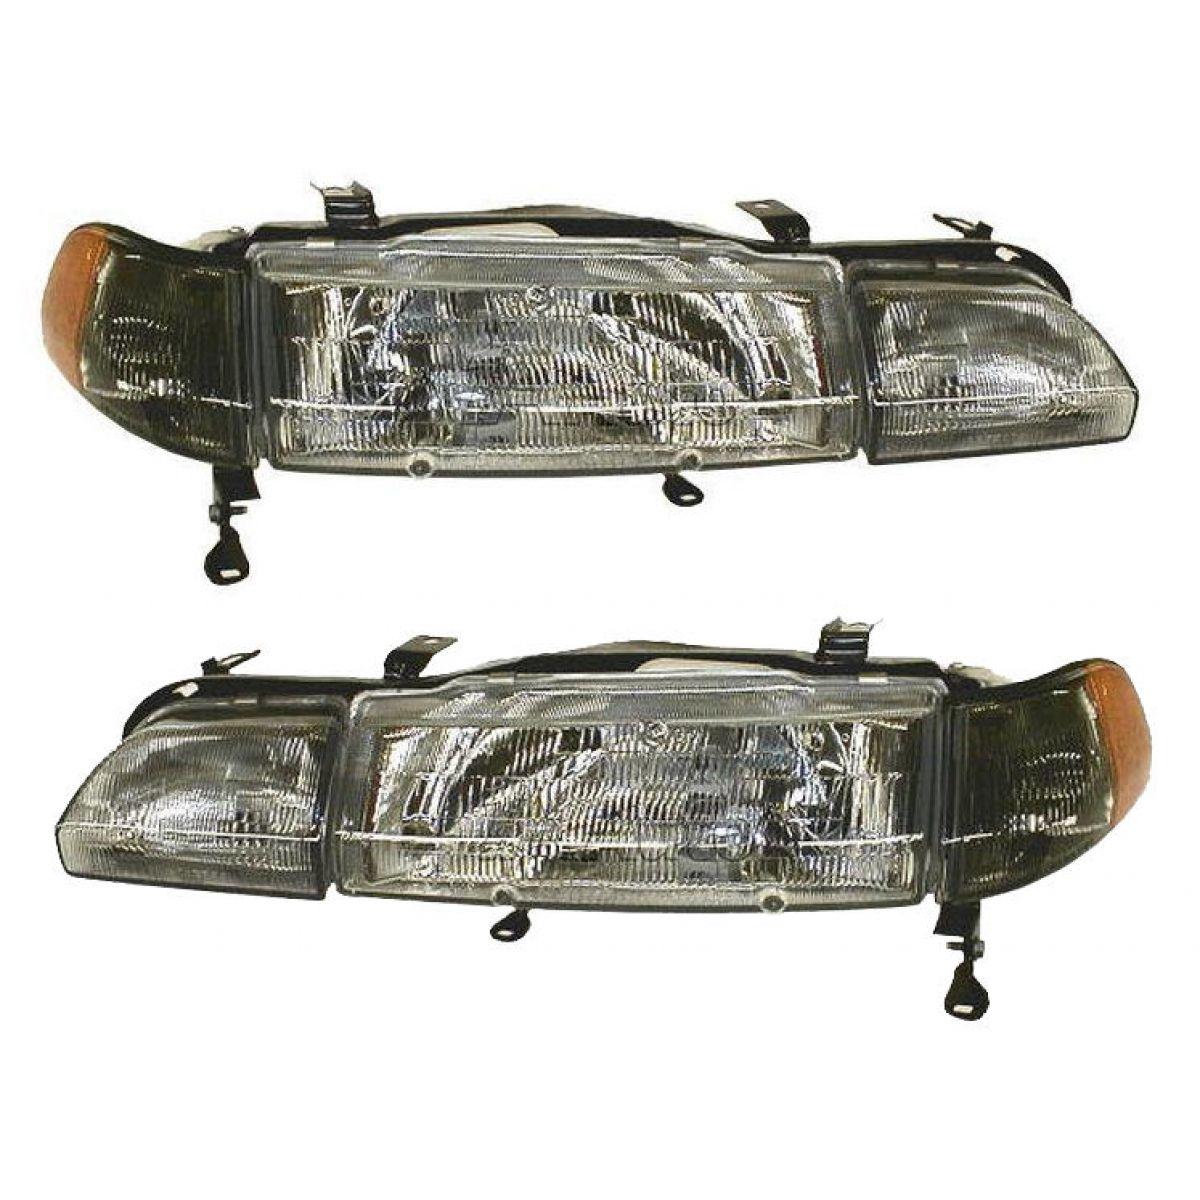 Front Headlights Headlamps W/ Marker & Fog Light Pair Set